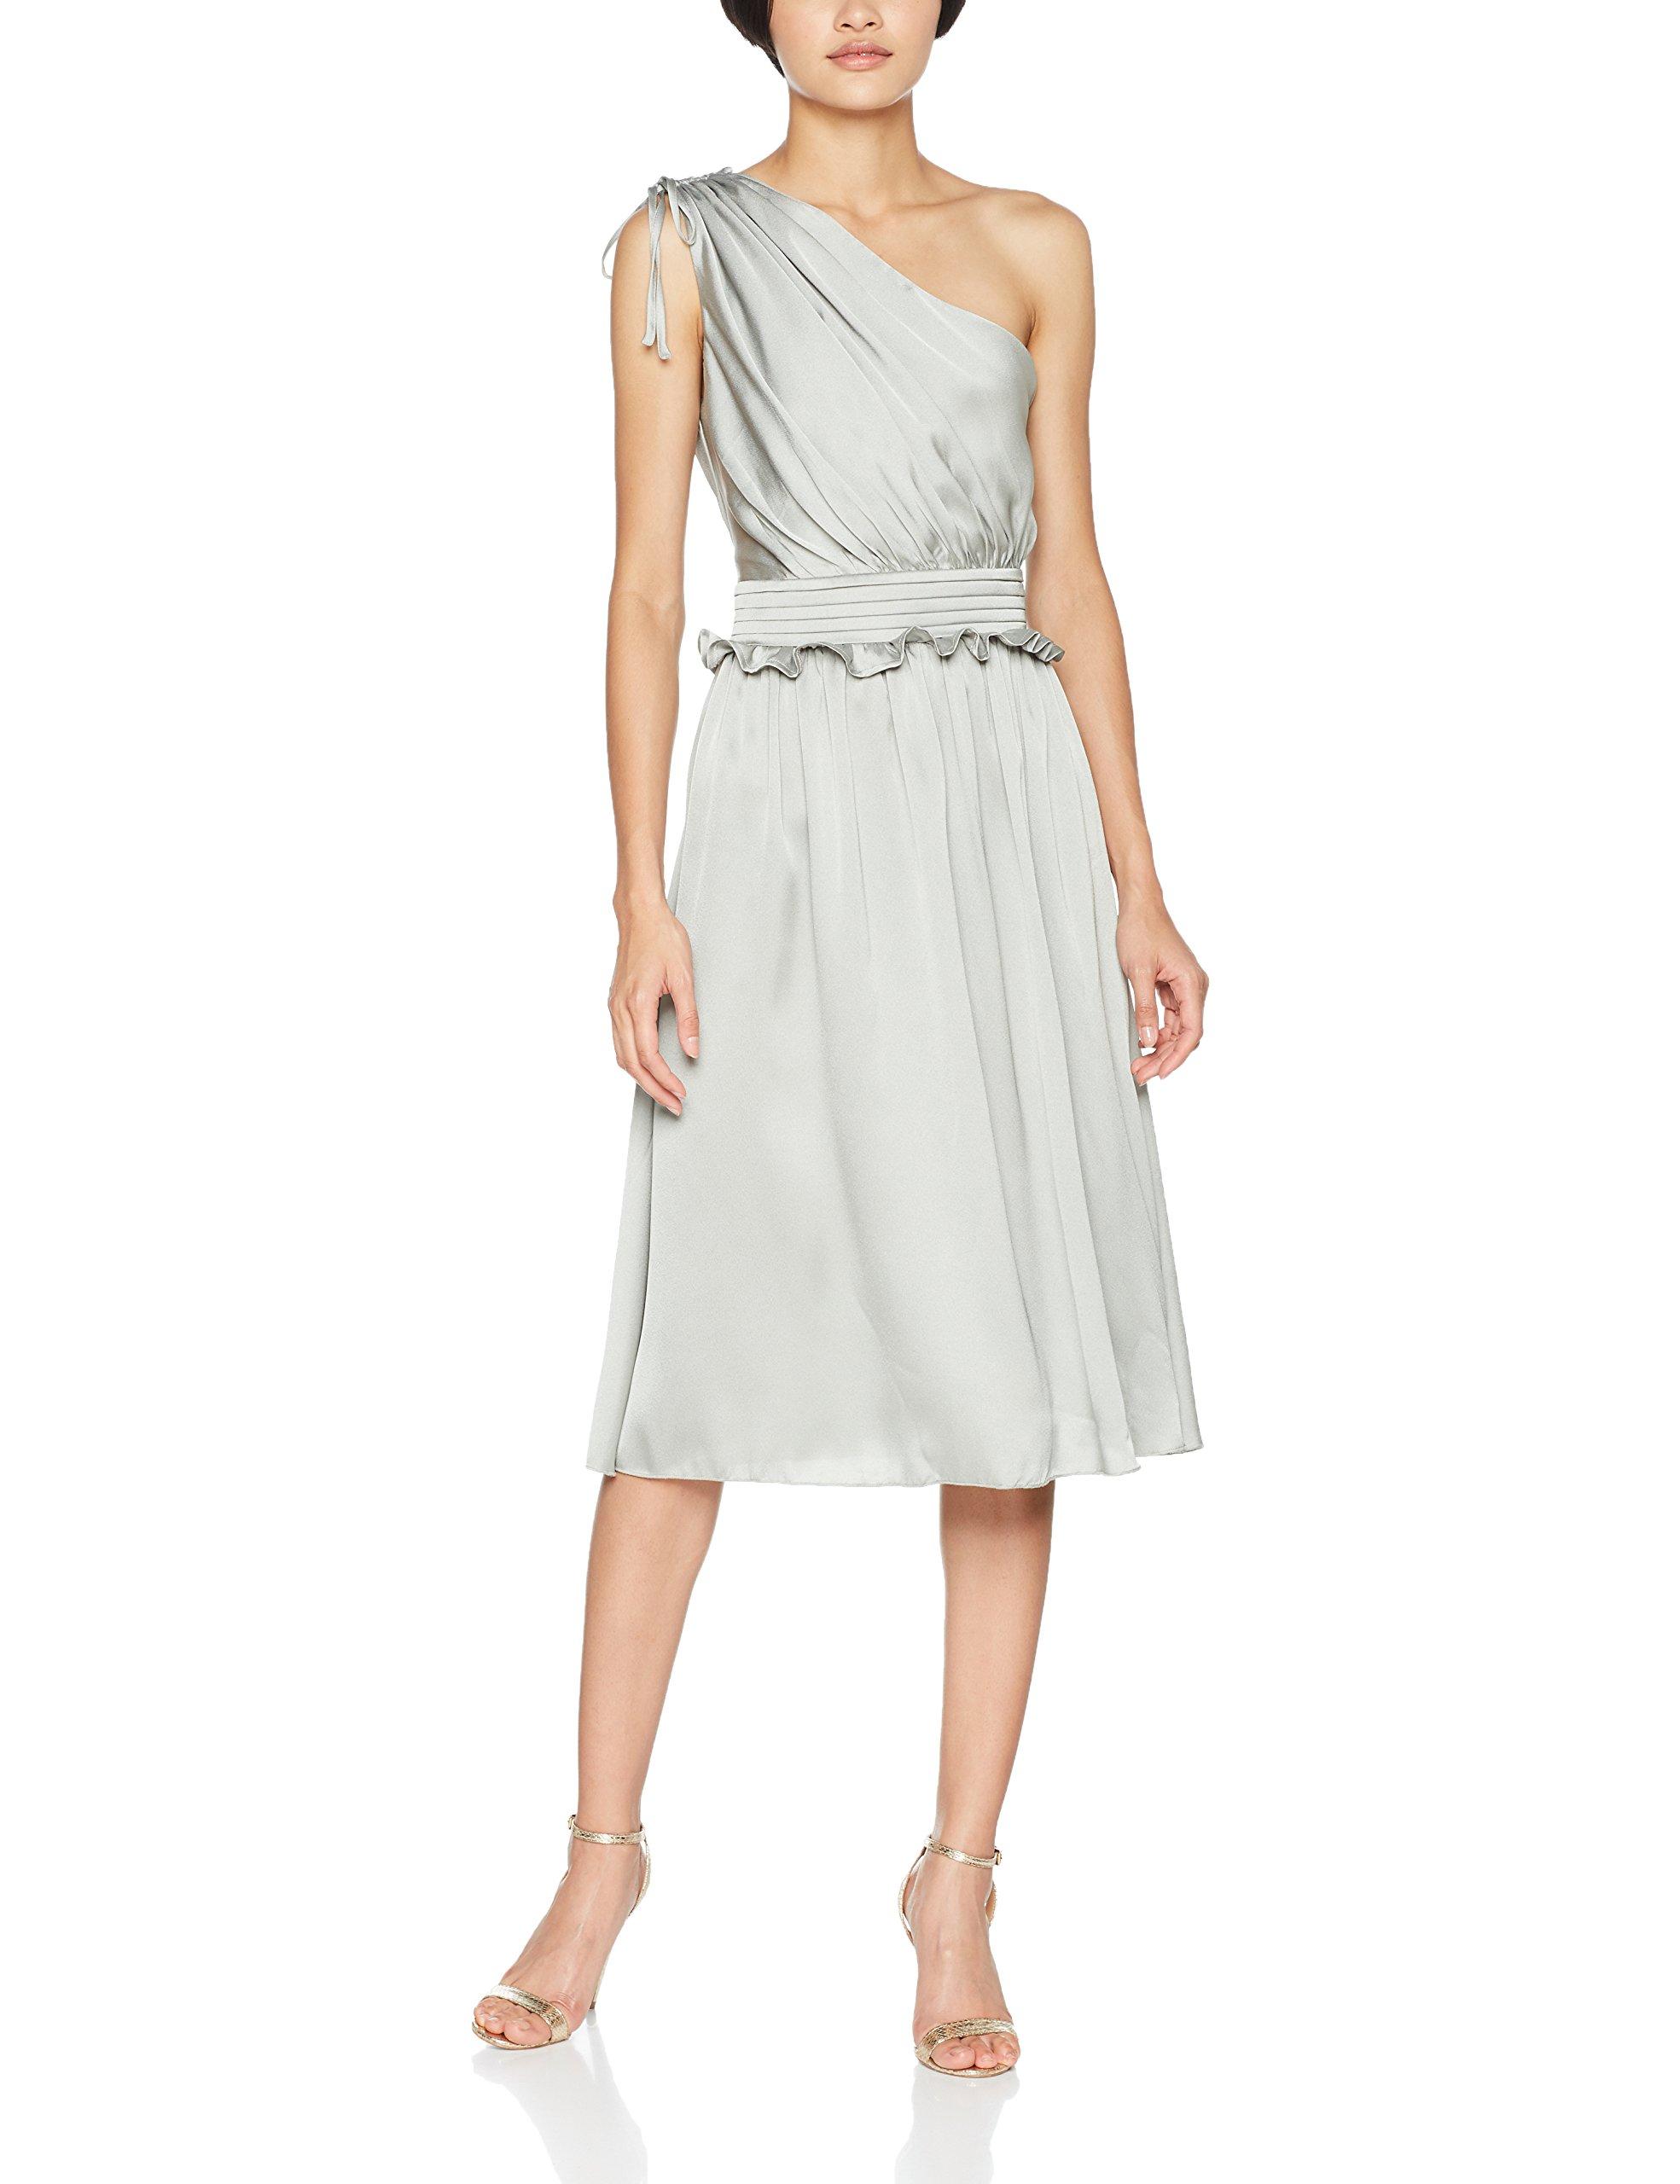 Midi 00138 Dress Mistress Femme Waterlily Little One Shoulder Satin RobeVert 8n0wmN